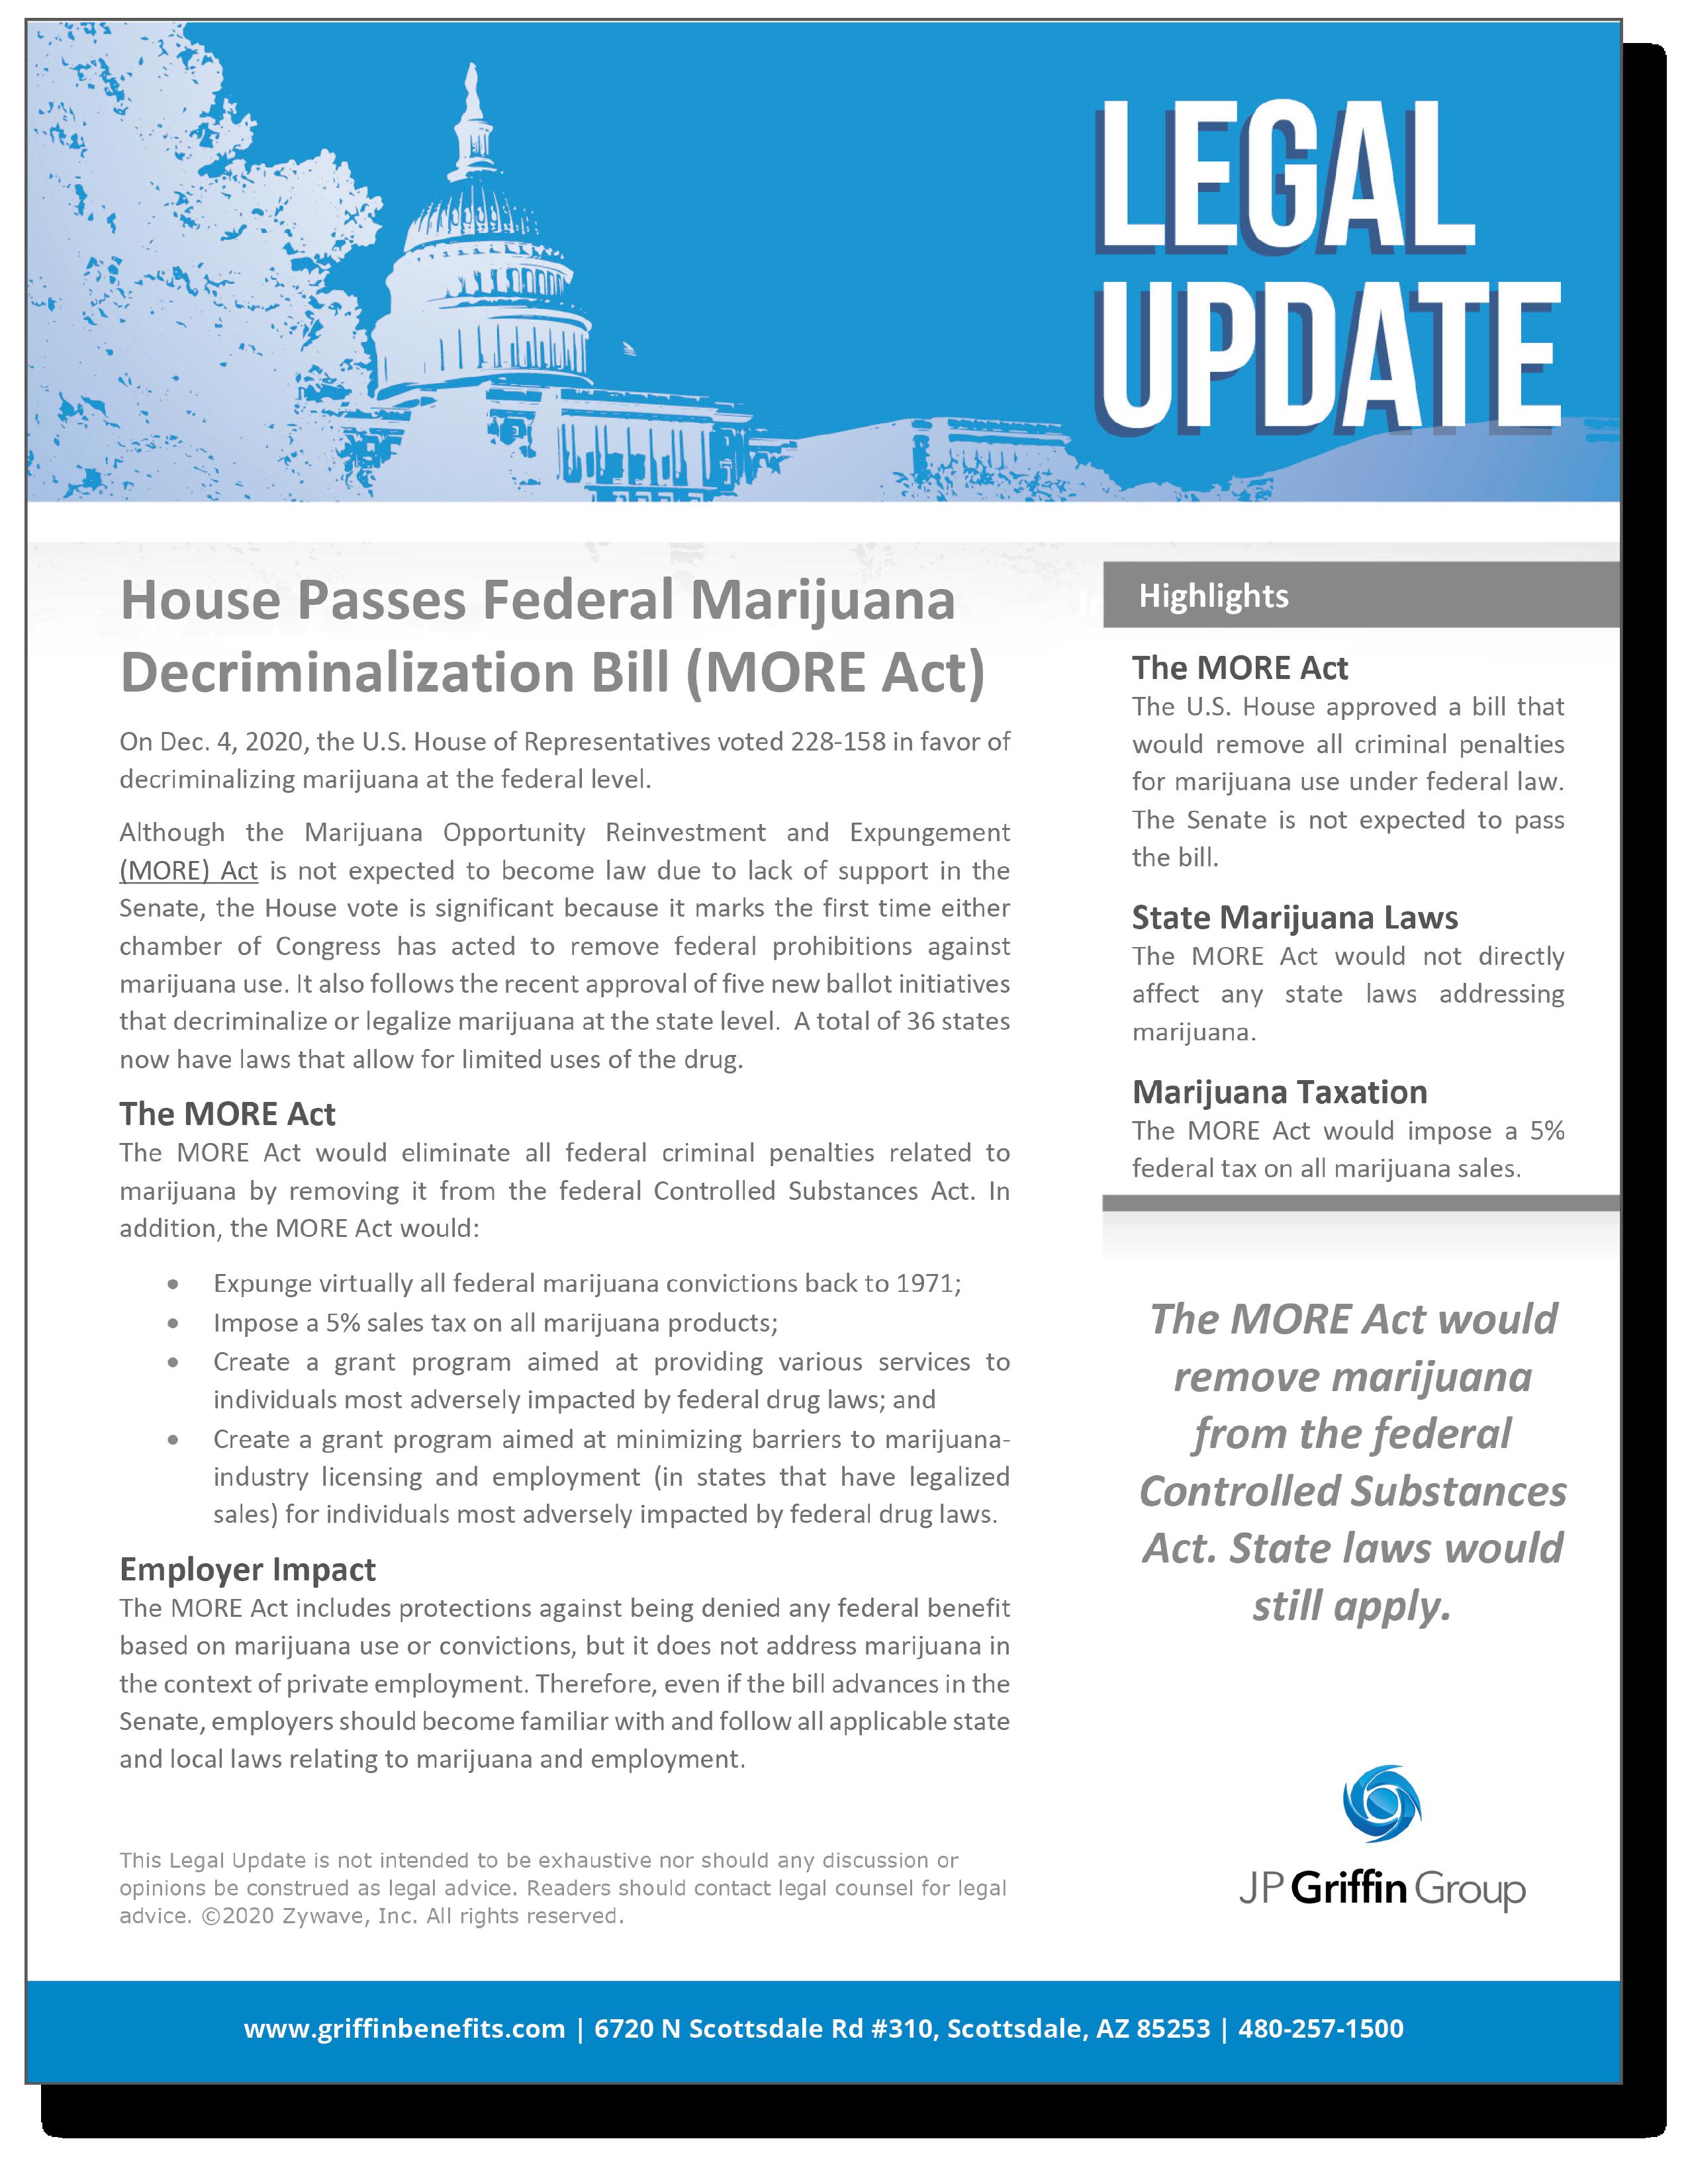 House Passes Federal Marijuana Decriminalization Bill_FINAL